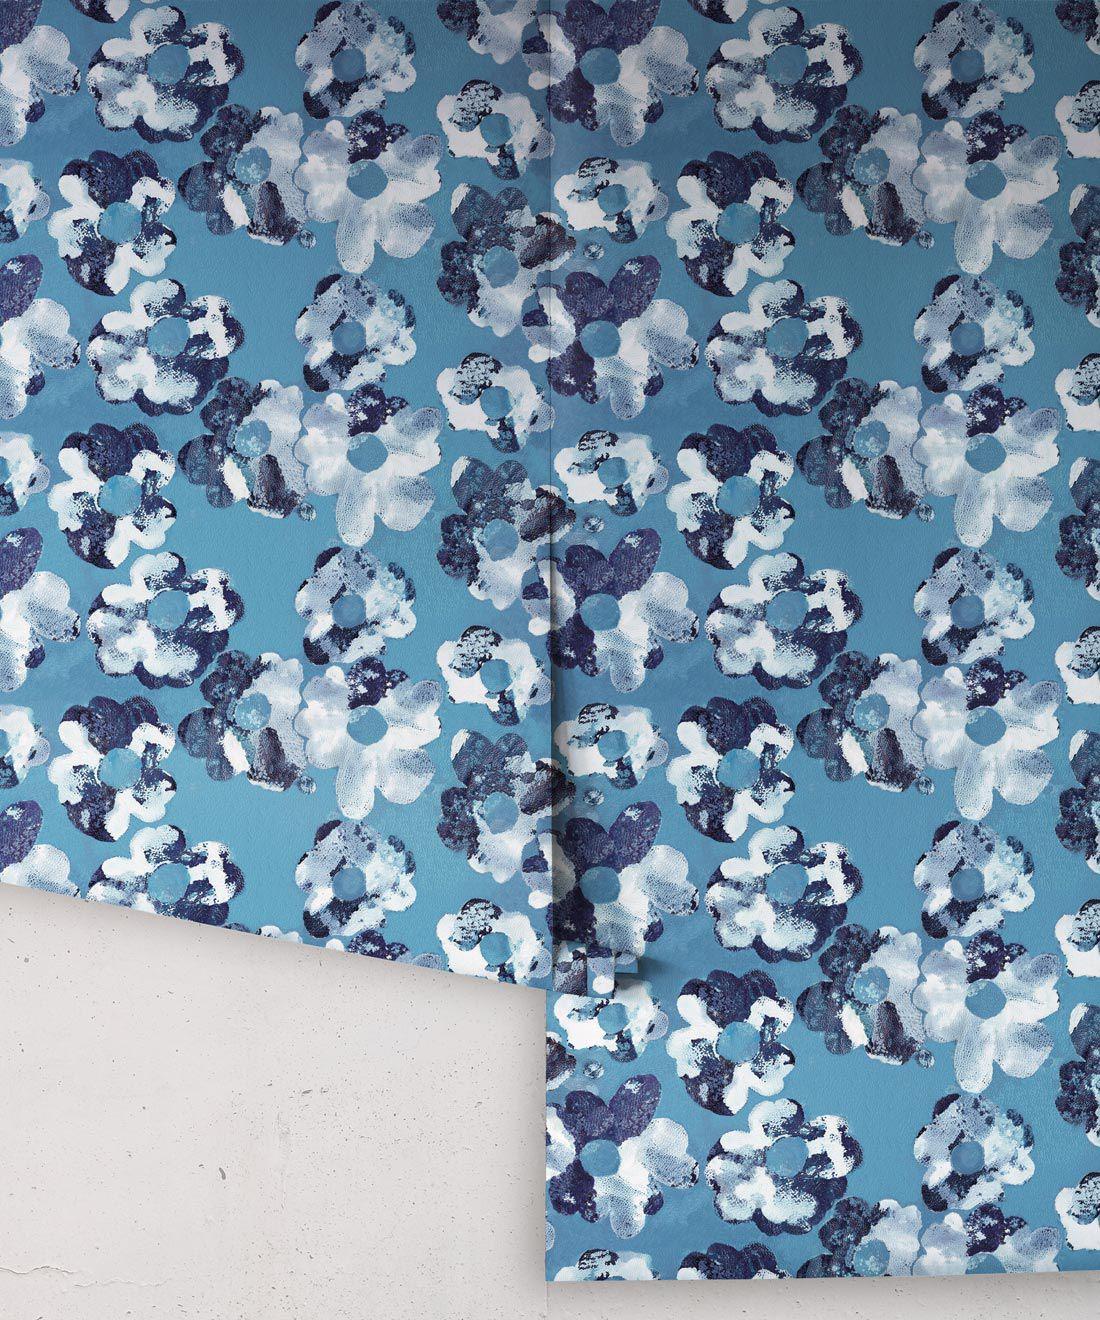 Cherry Blossom Wallpaper Indigo Blue • Shibori Floral • Rolls